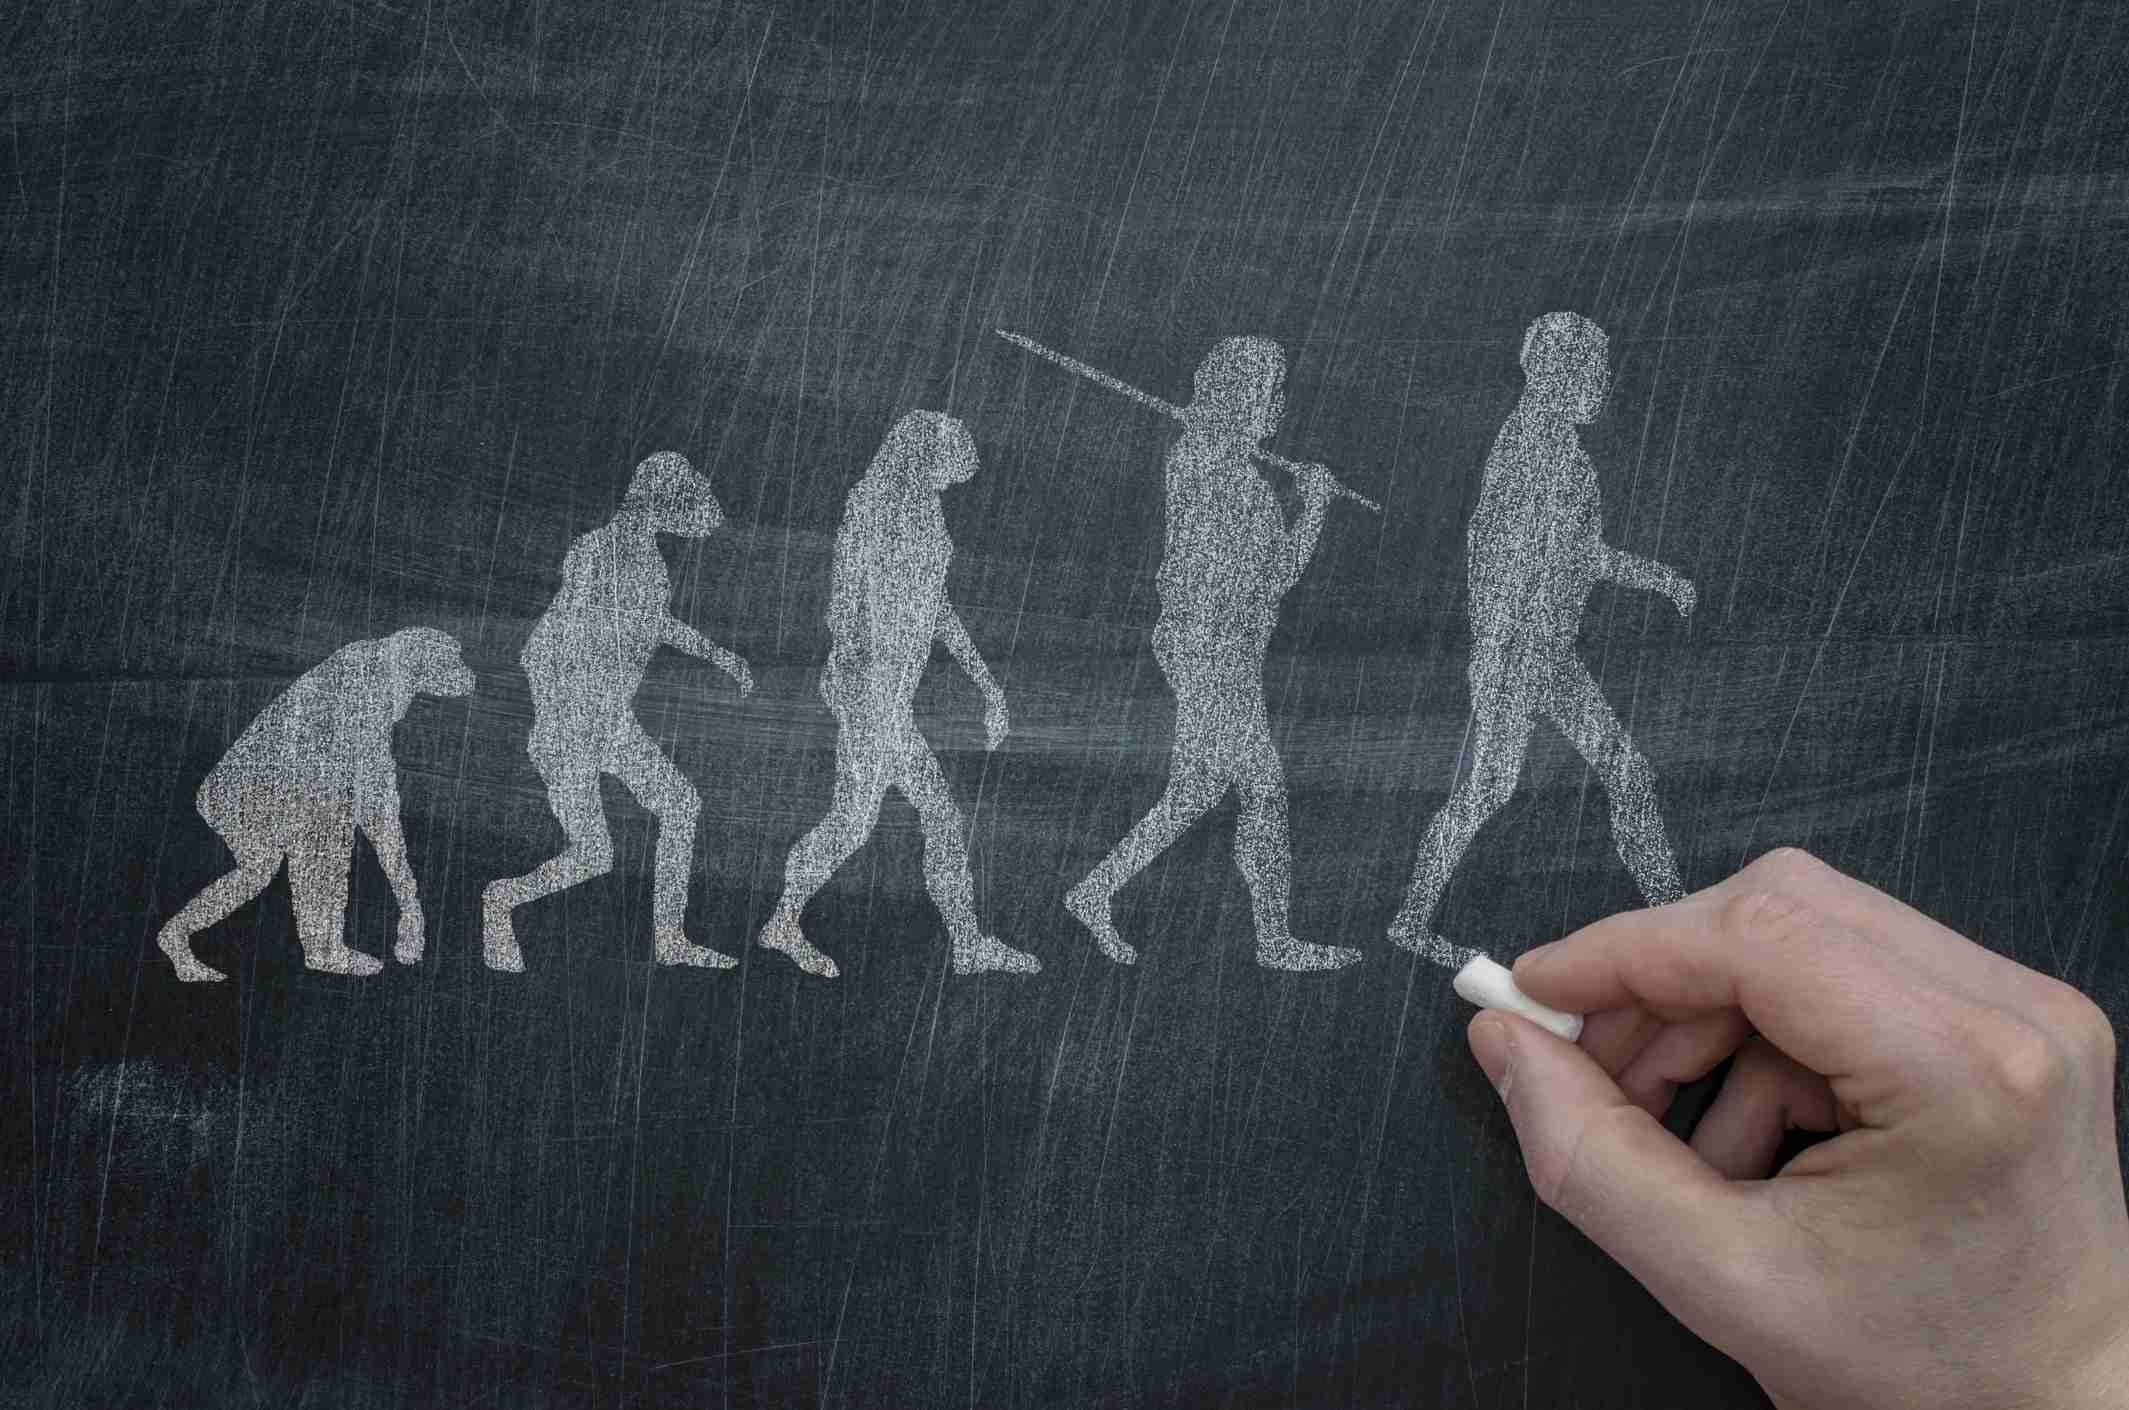 Human evolution drawn on chalkboard